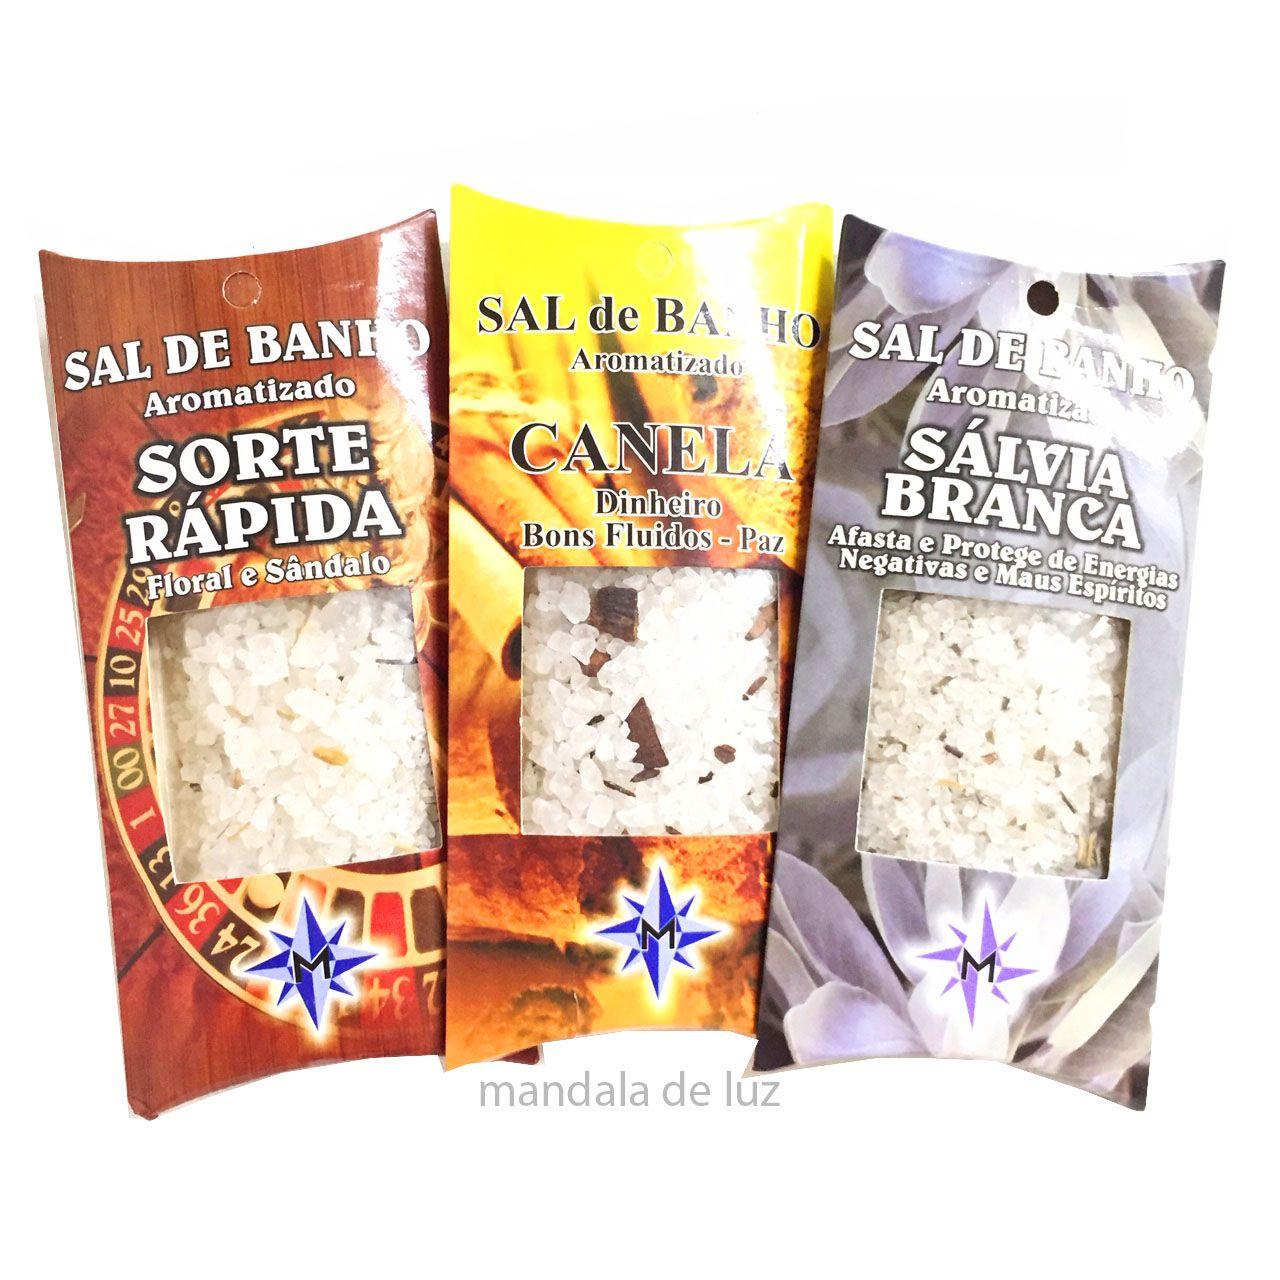 Kit Sal de Banho Aromatizado Sálvia Branca, Sorte Rápida, Canela - Atacado